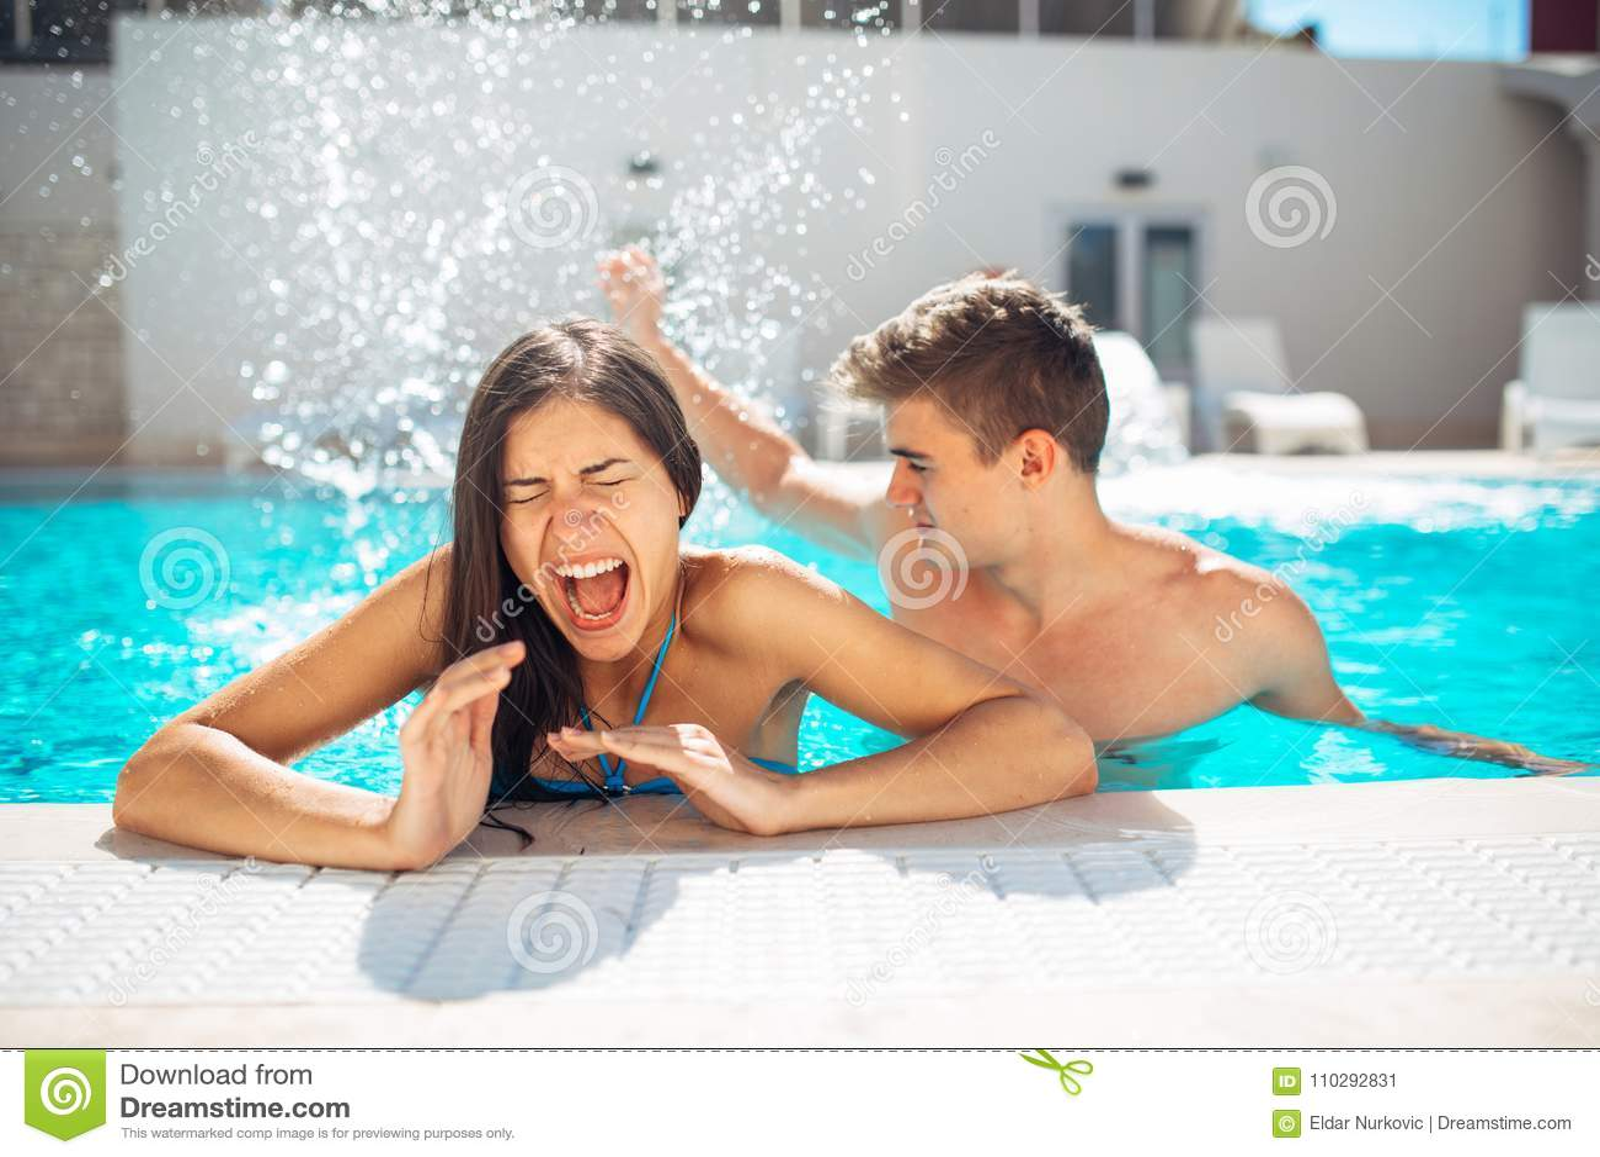 Screaming young teenage girl at the pool annoyed with pool splashing.Splashing water and playing games at the pool,having fun